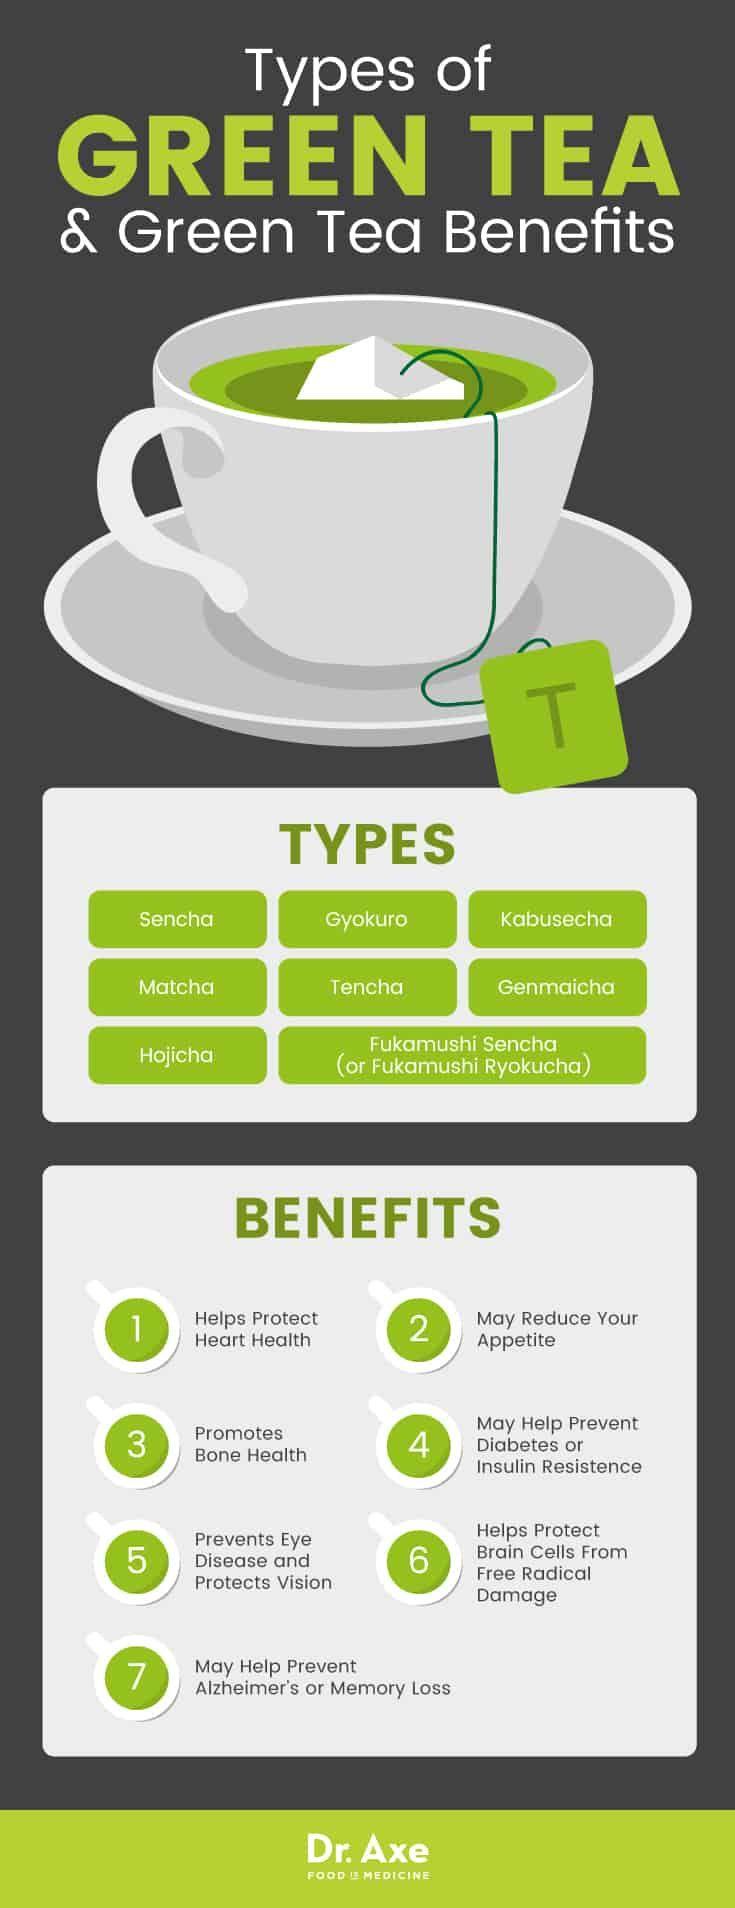 Top 7 Benefits Of Green Tea Plus Recipes Side Effects And More Dr Axe Green Tea Benefits Tea Benefits Effects Of Green Tea